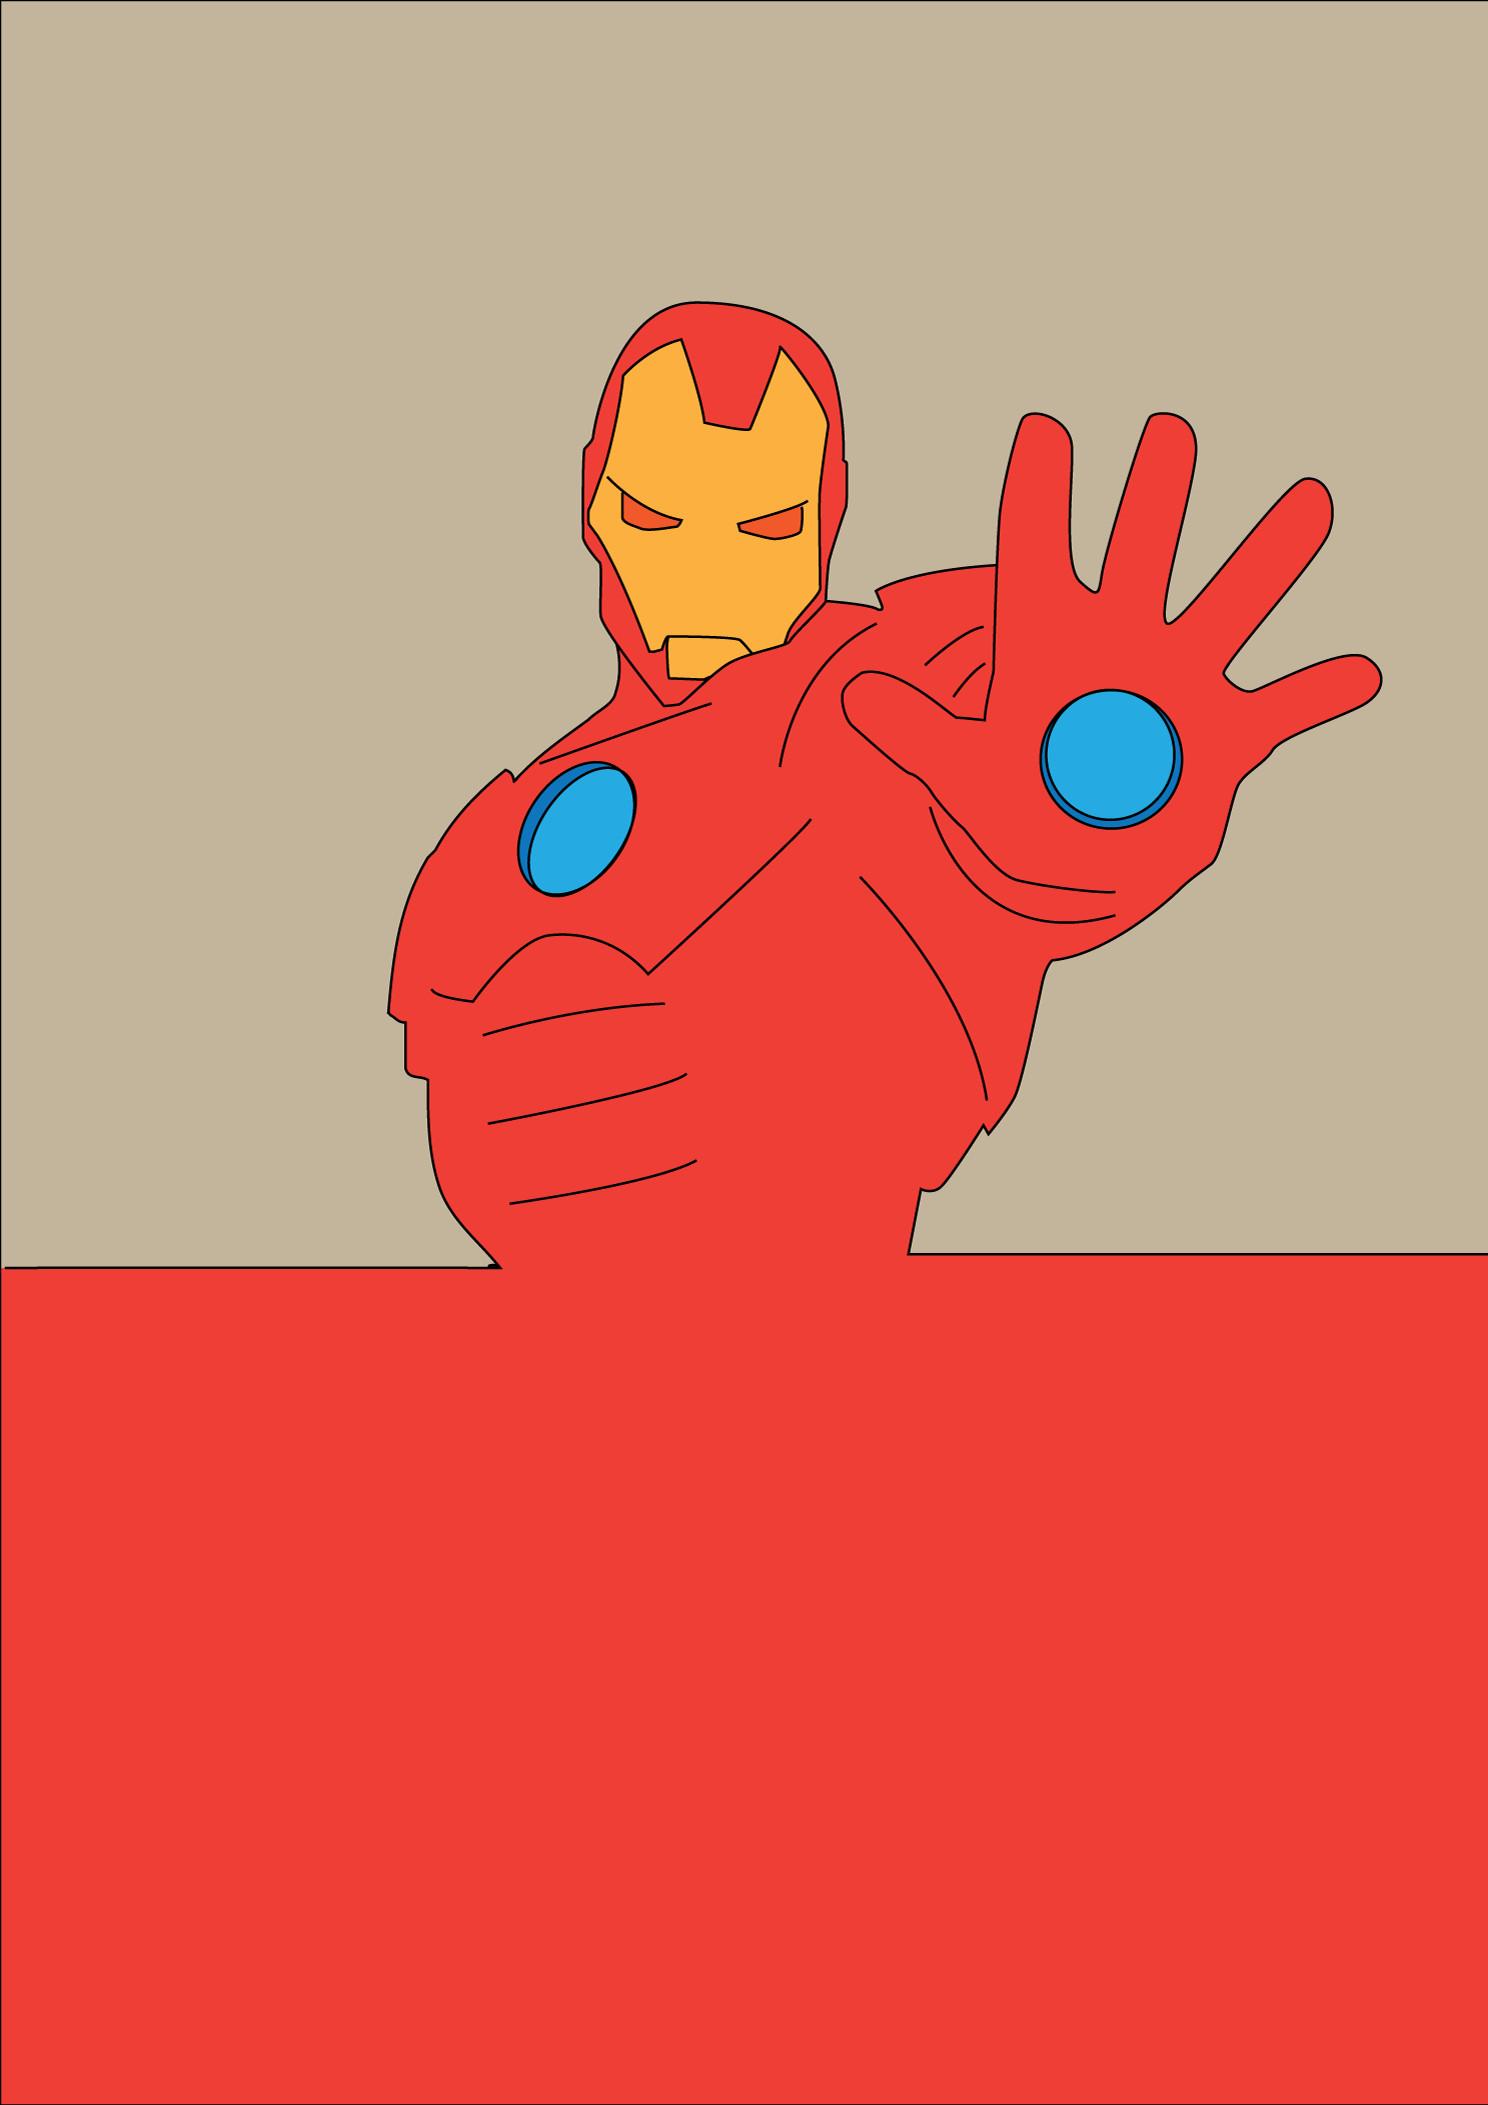 Akshay Kumar Iron Man Wallpaper